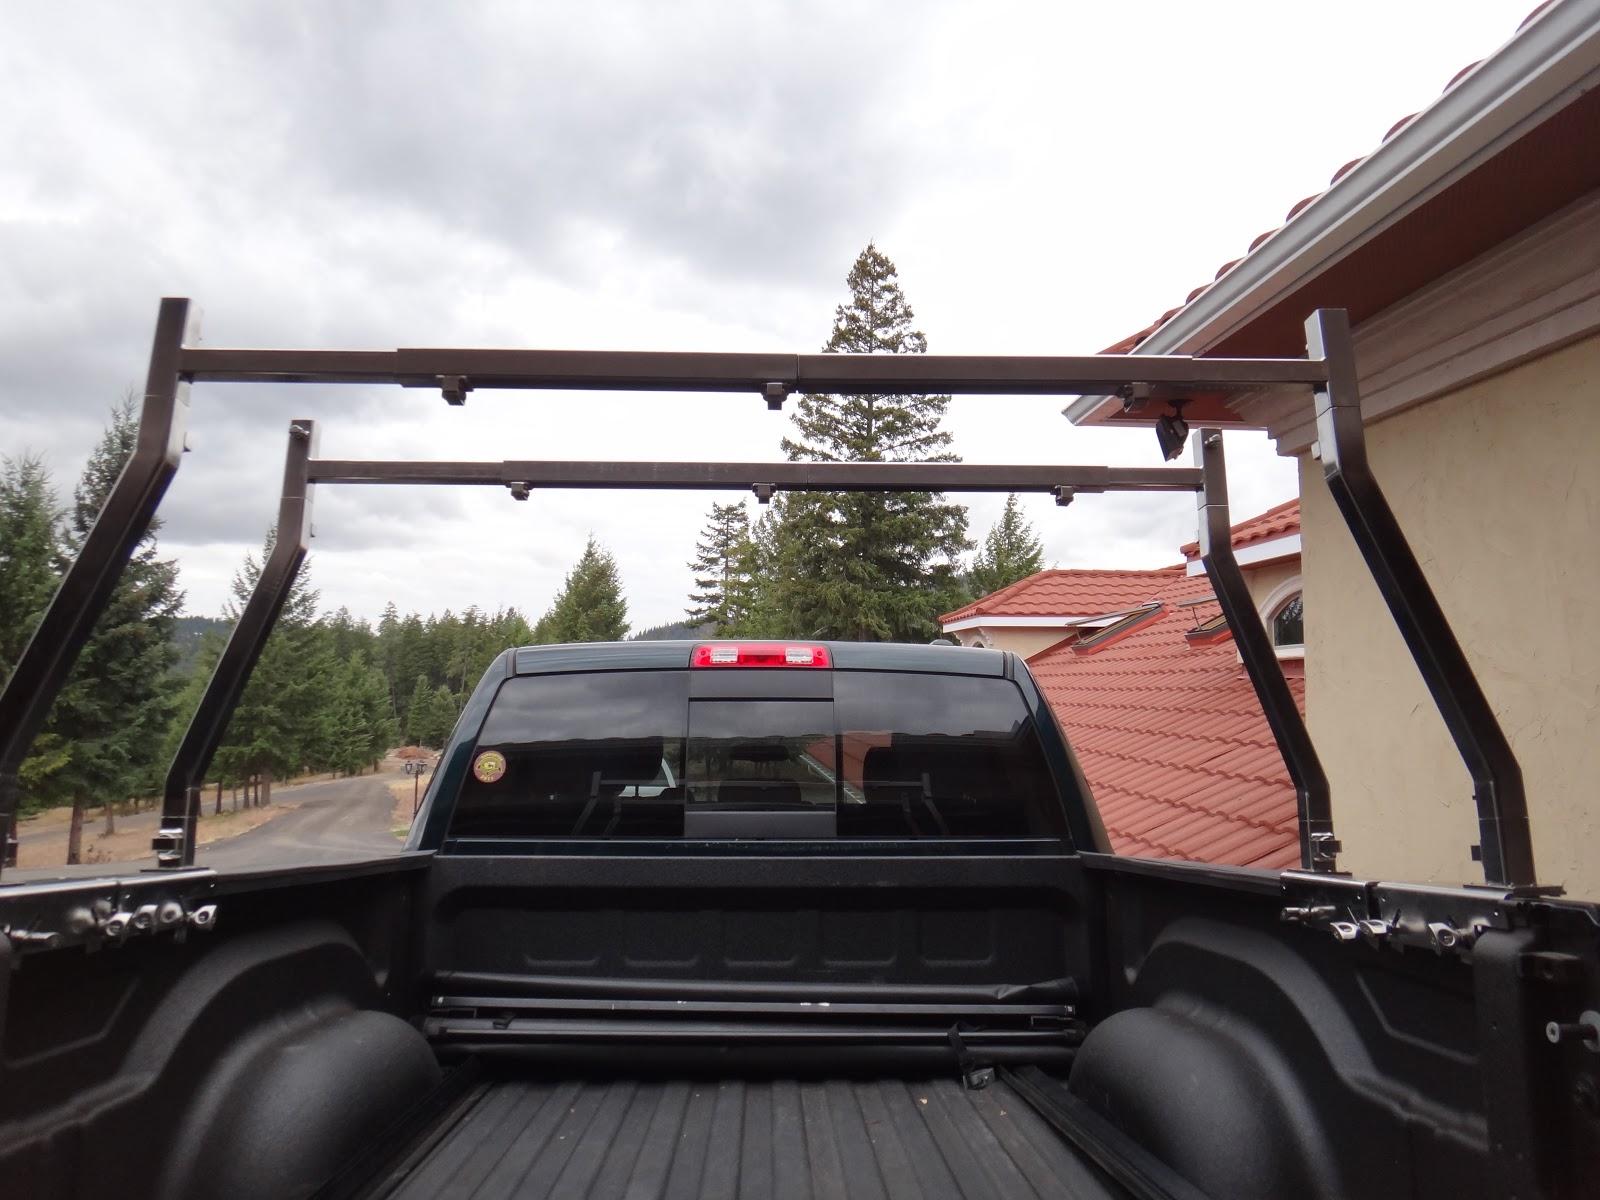 Z-RAK TRUCK RACK: Do you need a truck rack?